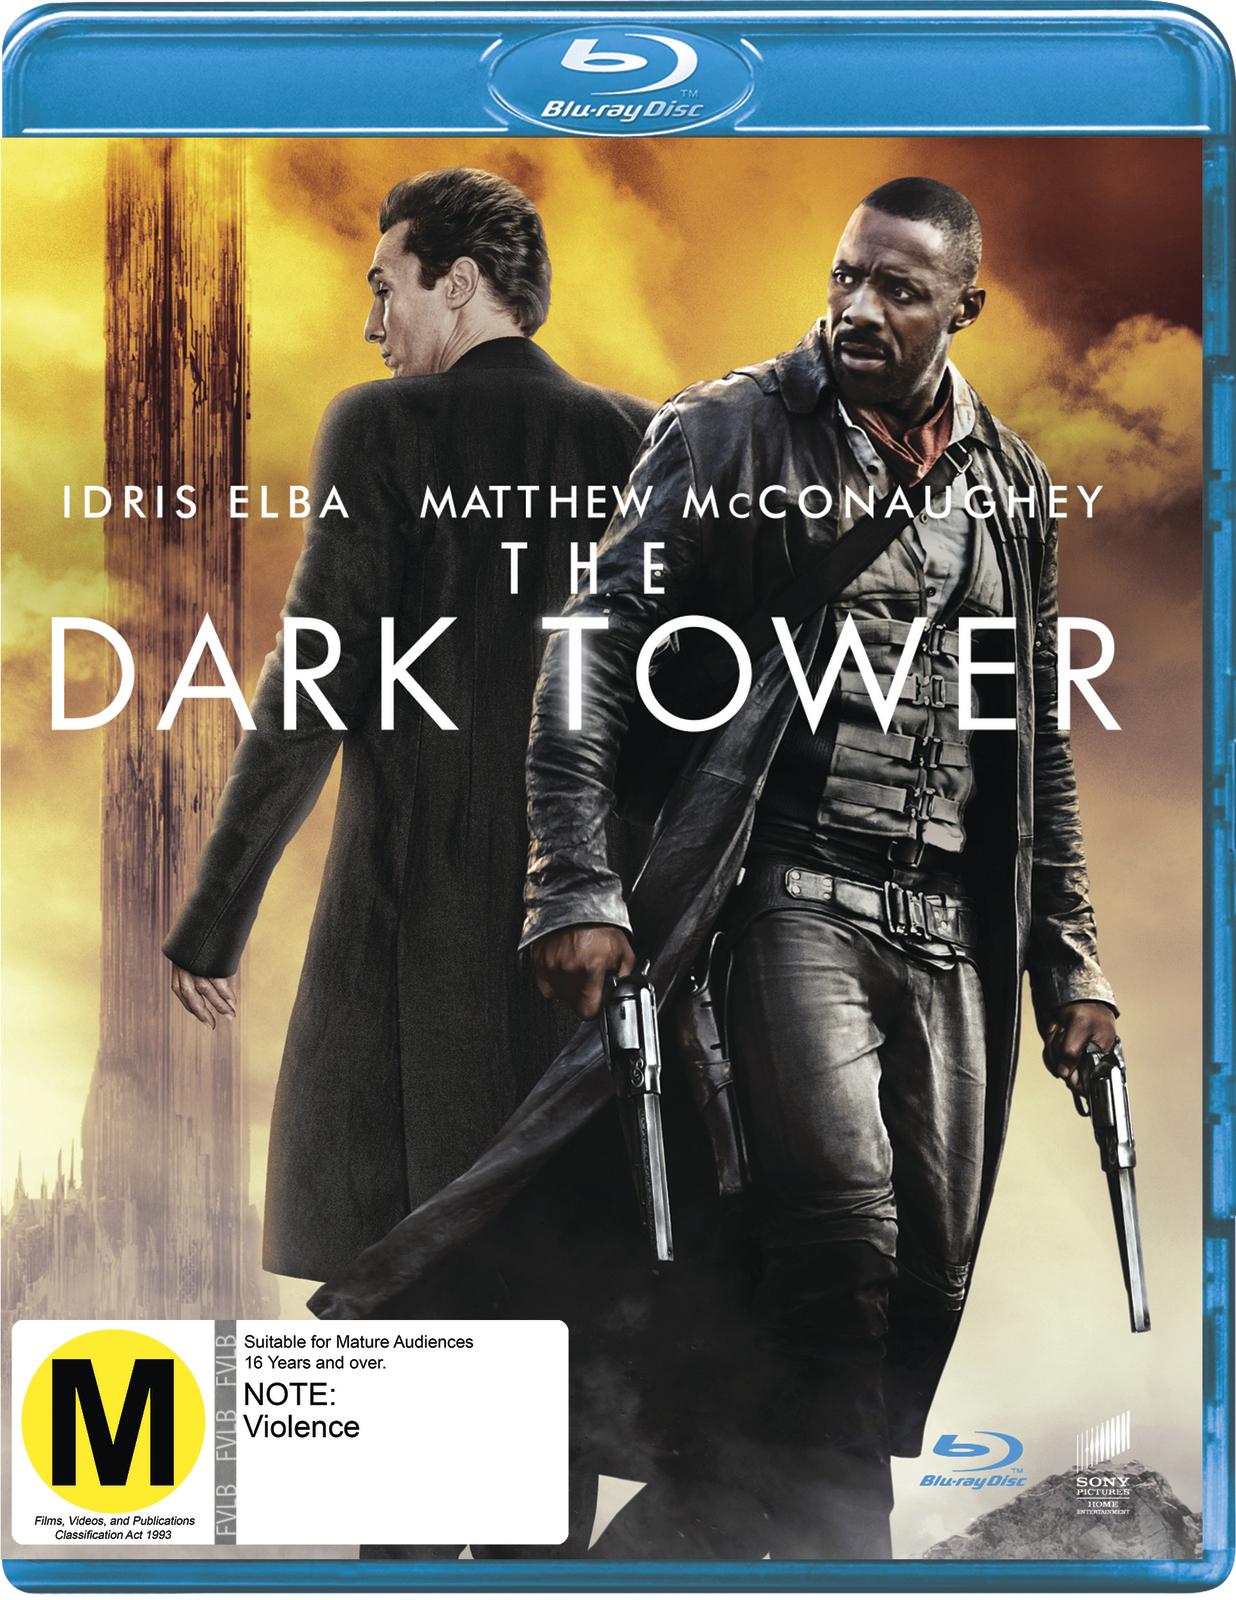 The Dark Tower on Blu-ray image